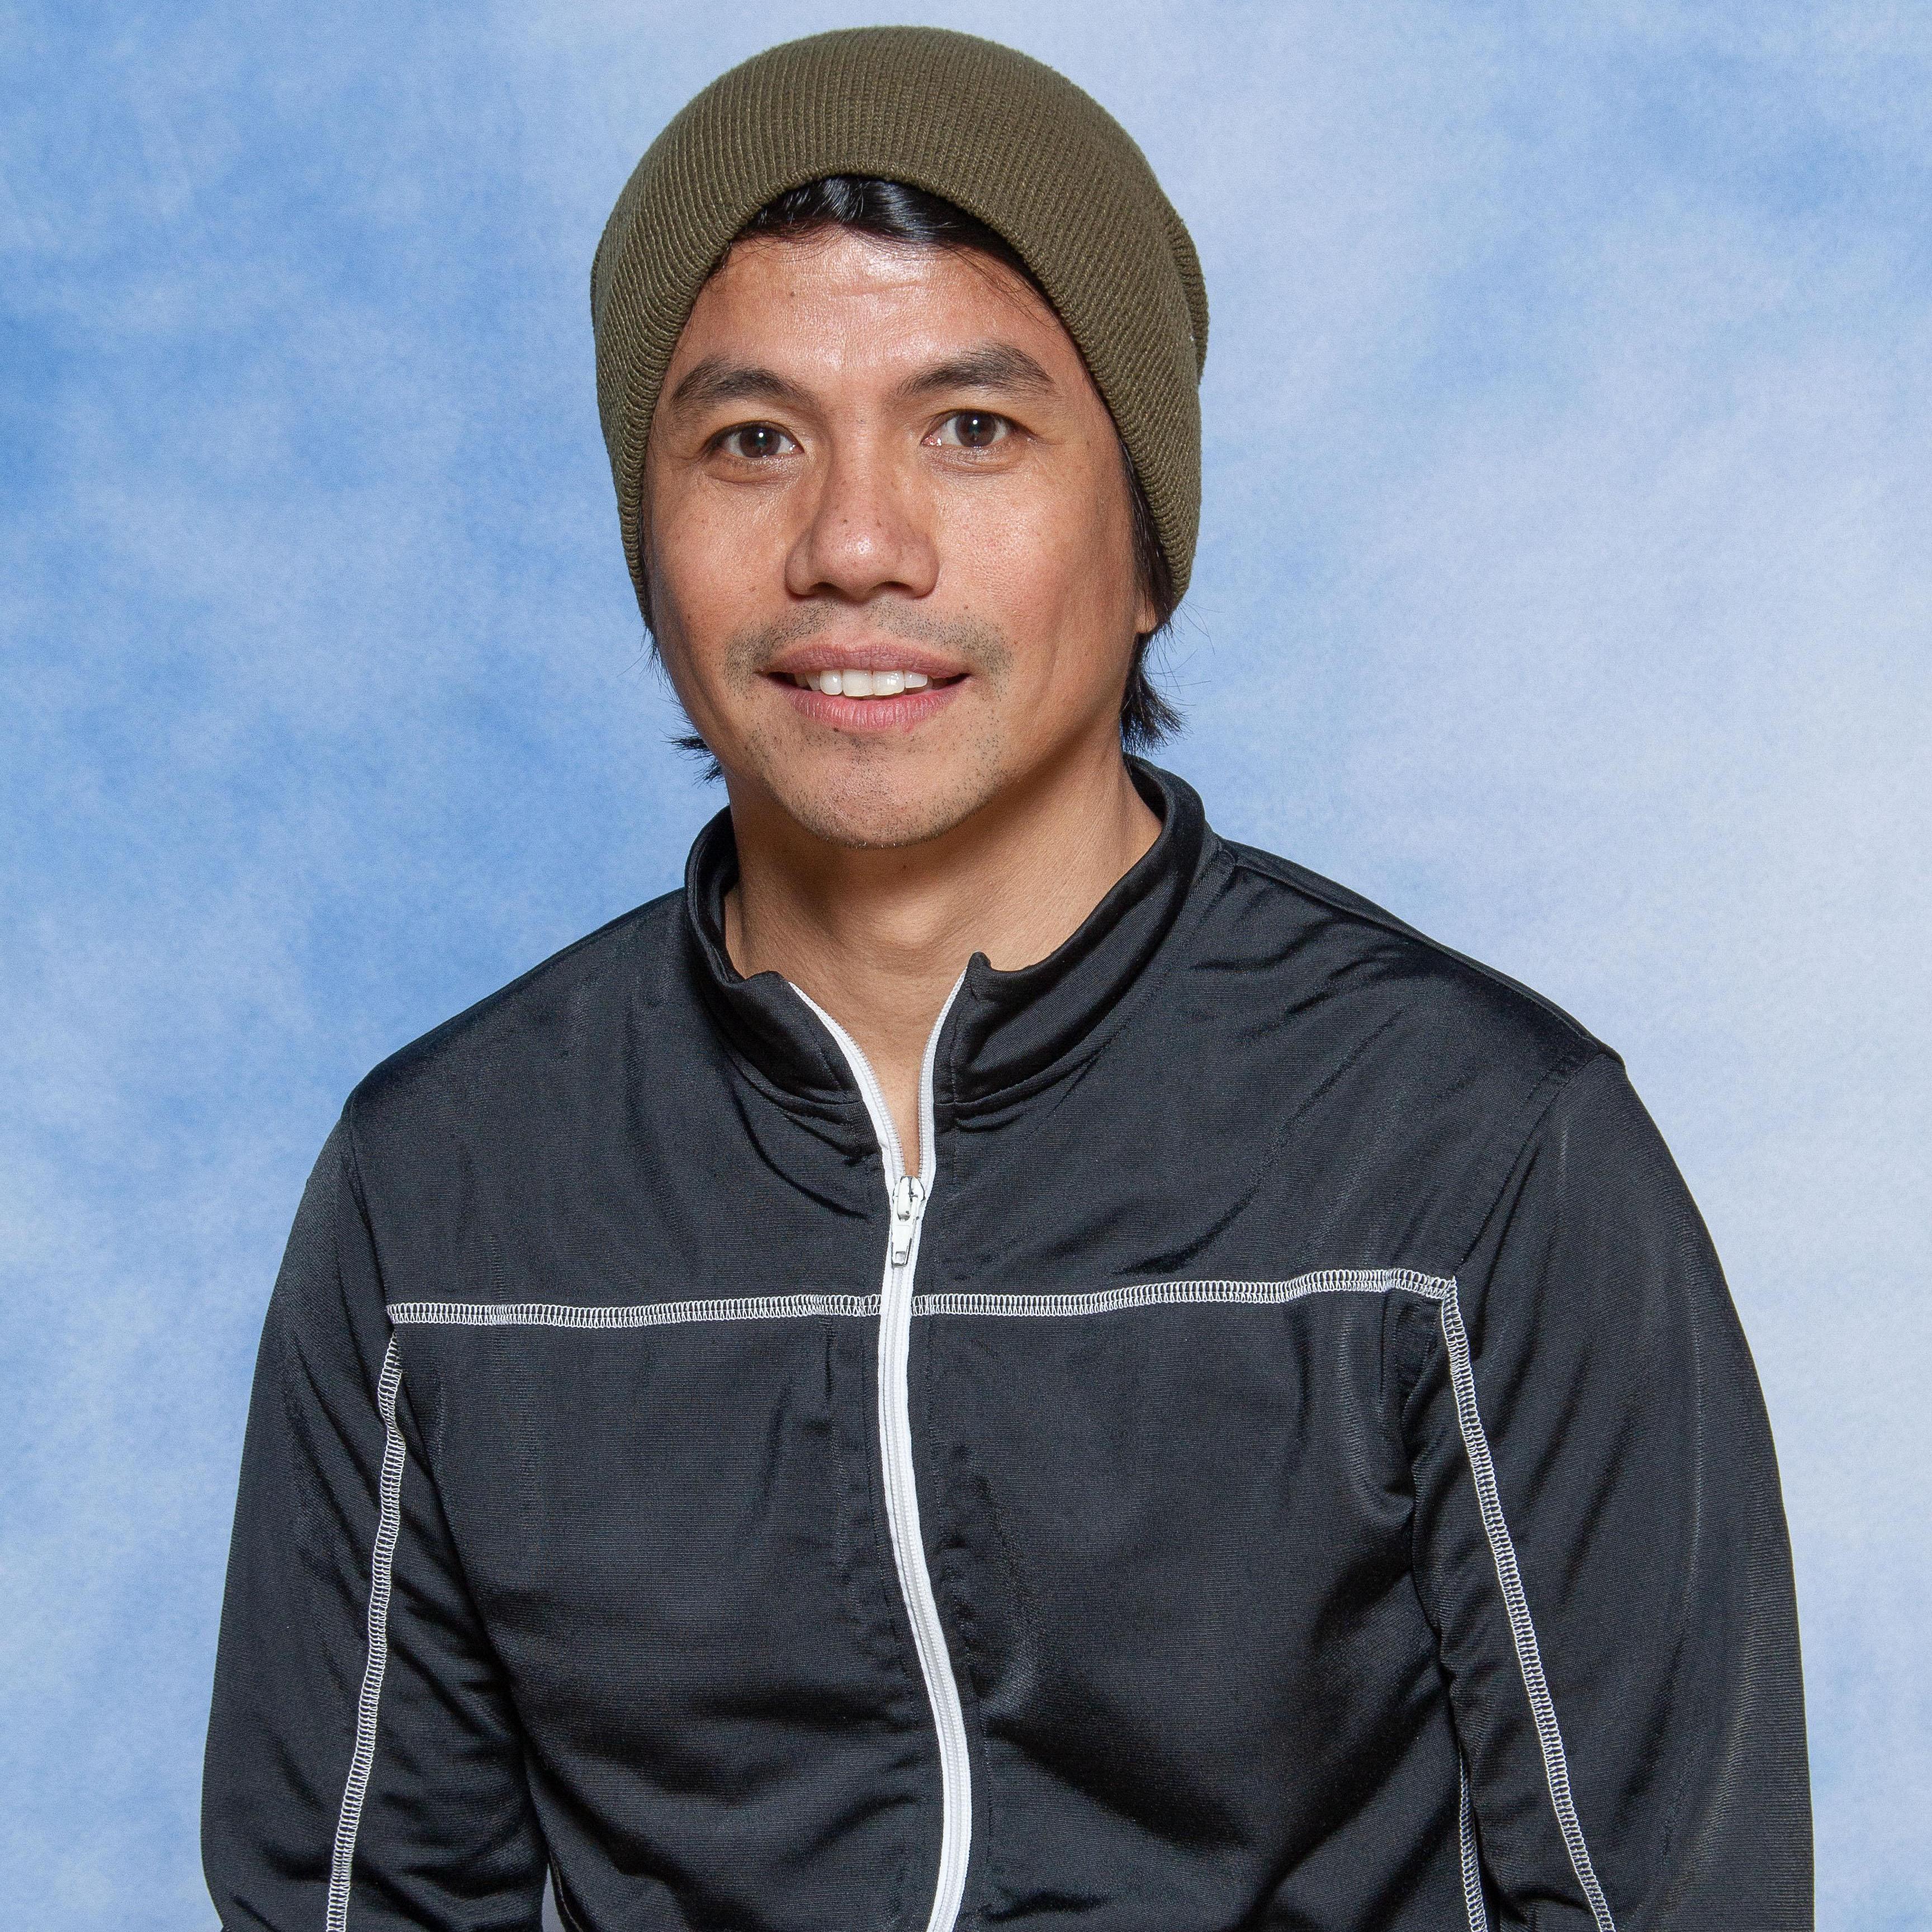 R. Manglicmot's Profile Photo